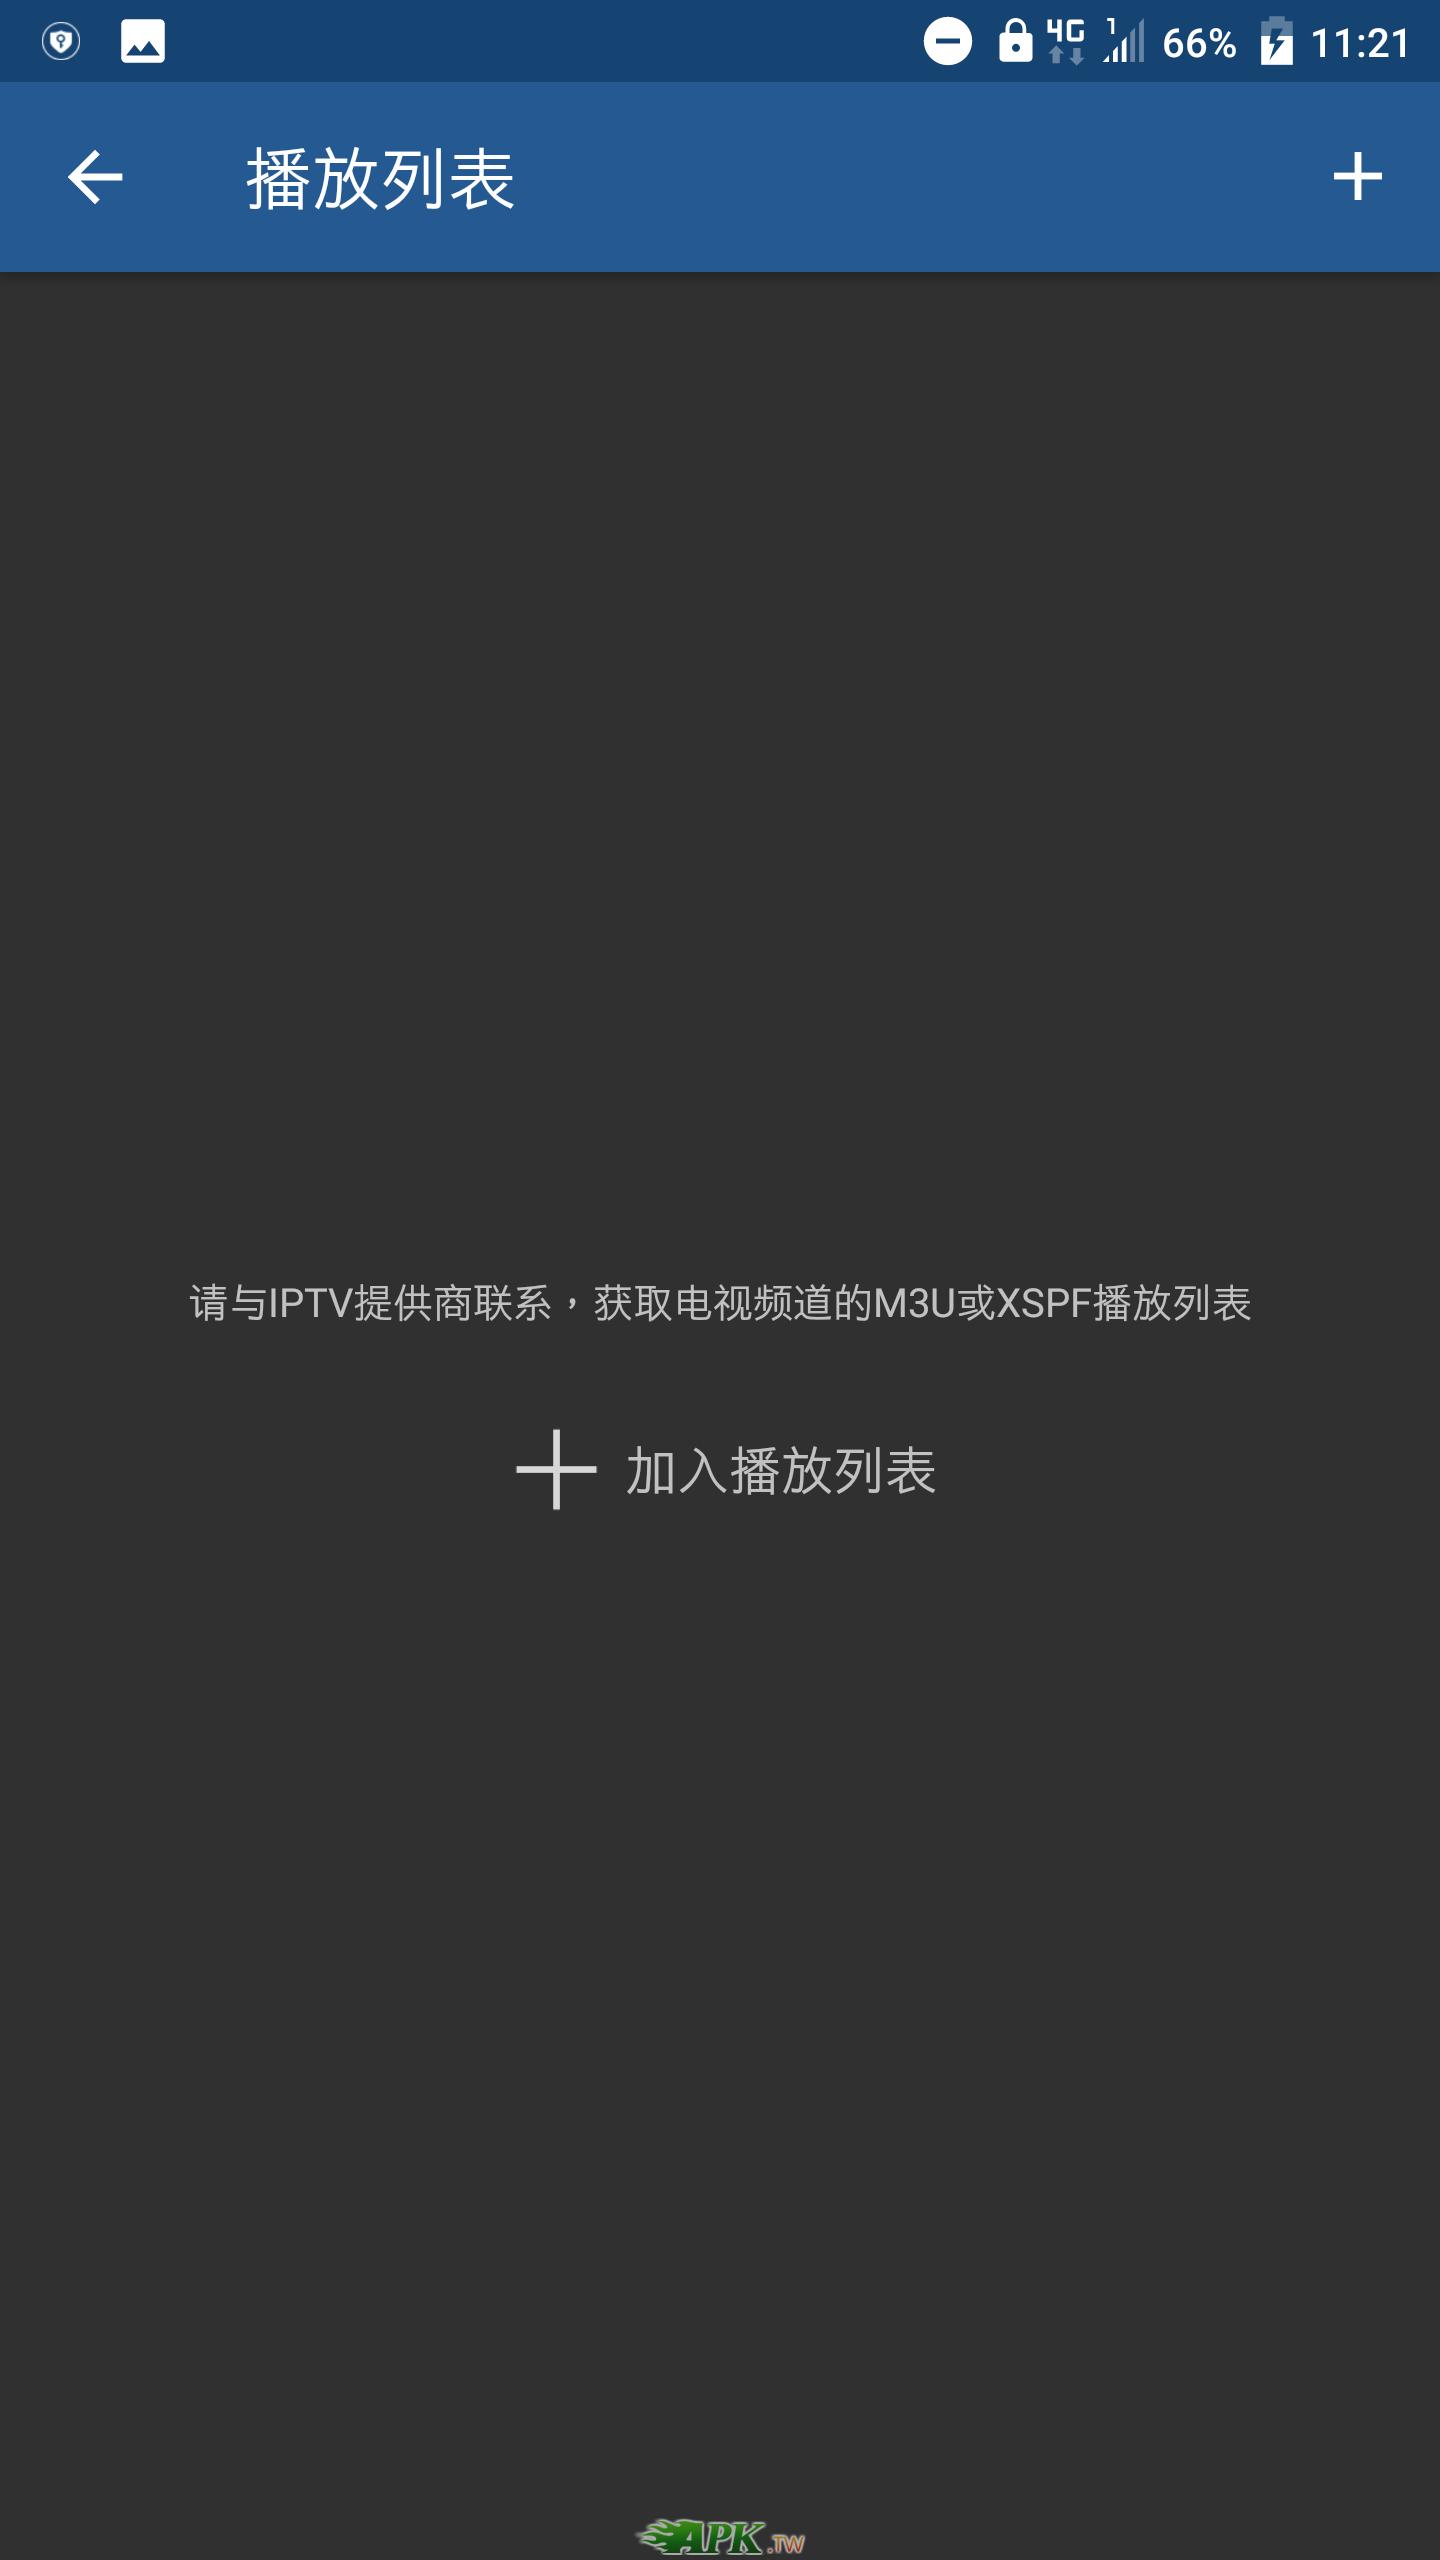 Screenshot_20190110-232137.png